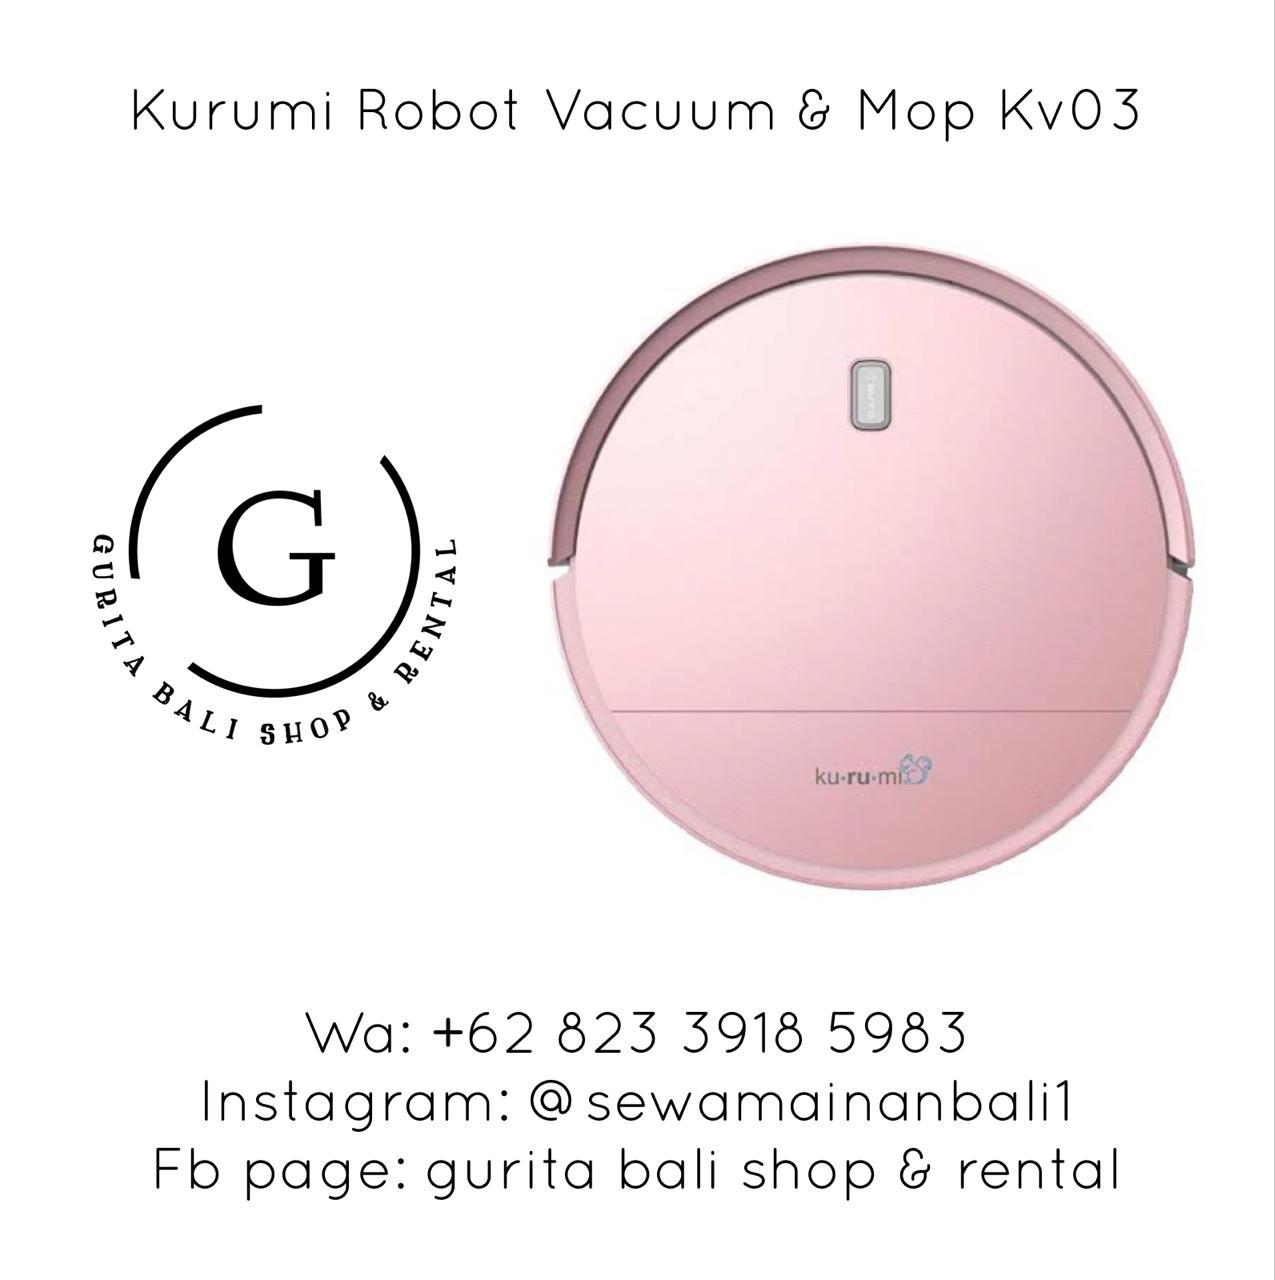 KURUMI ROBOT VACUUM & MOP KV03